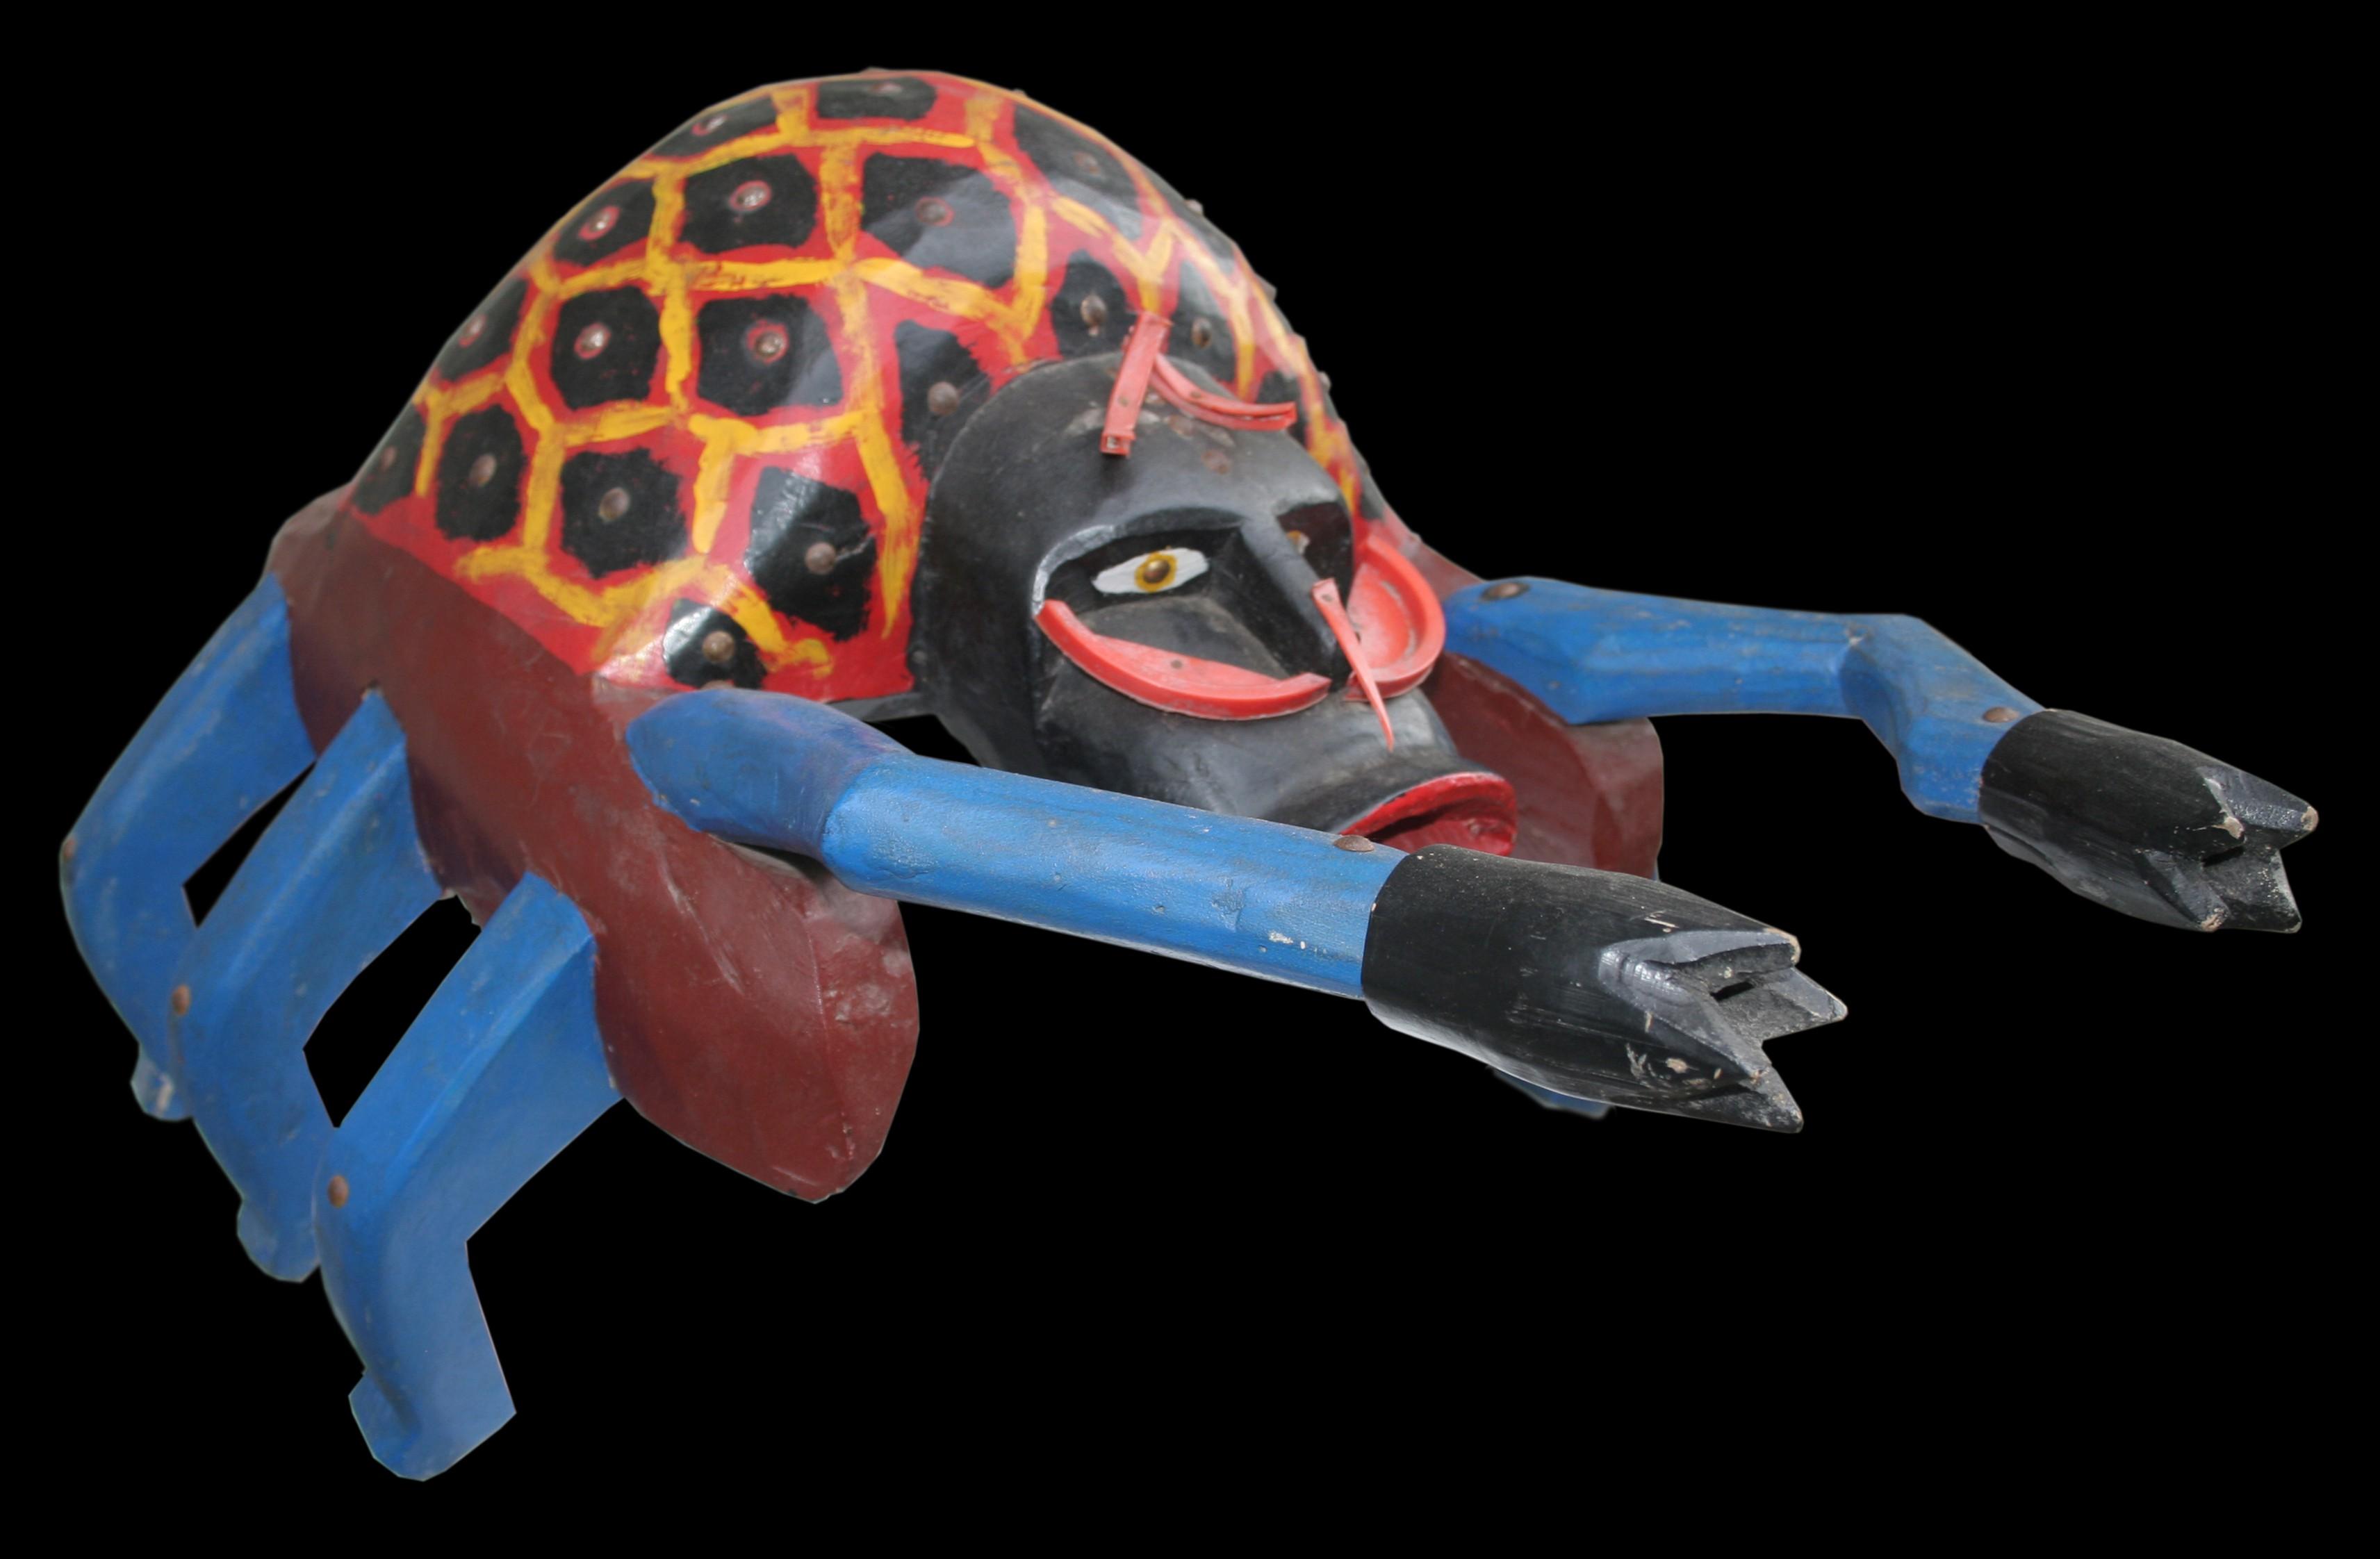 Spider - Sculpture polychrome - Camara Demba - 2010